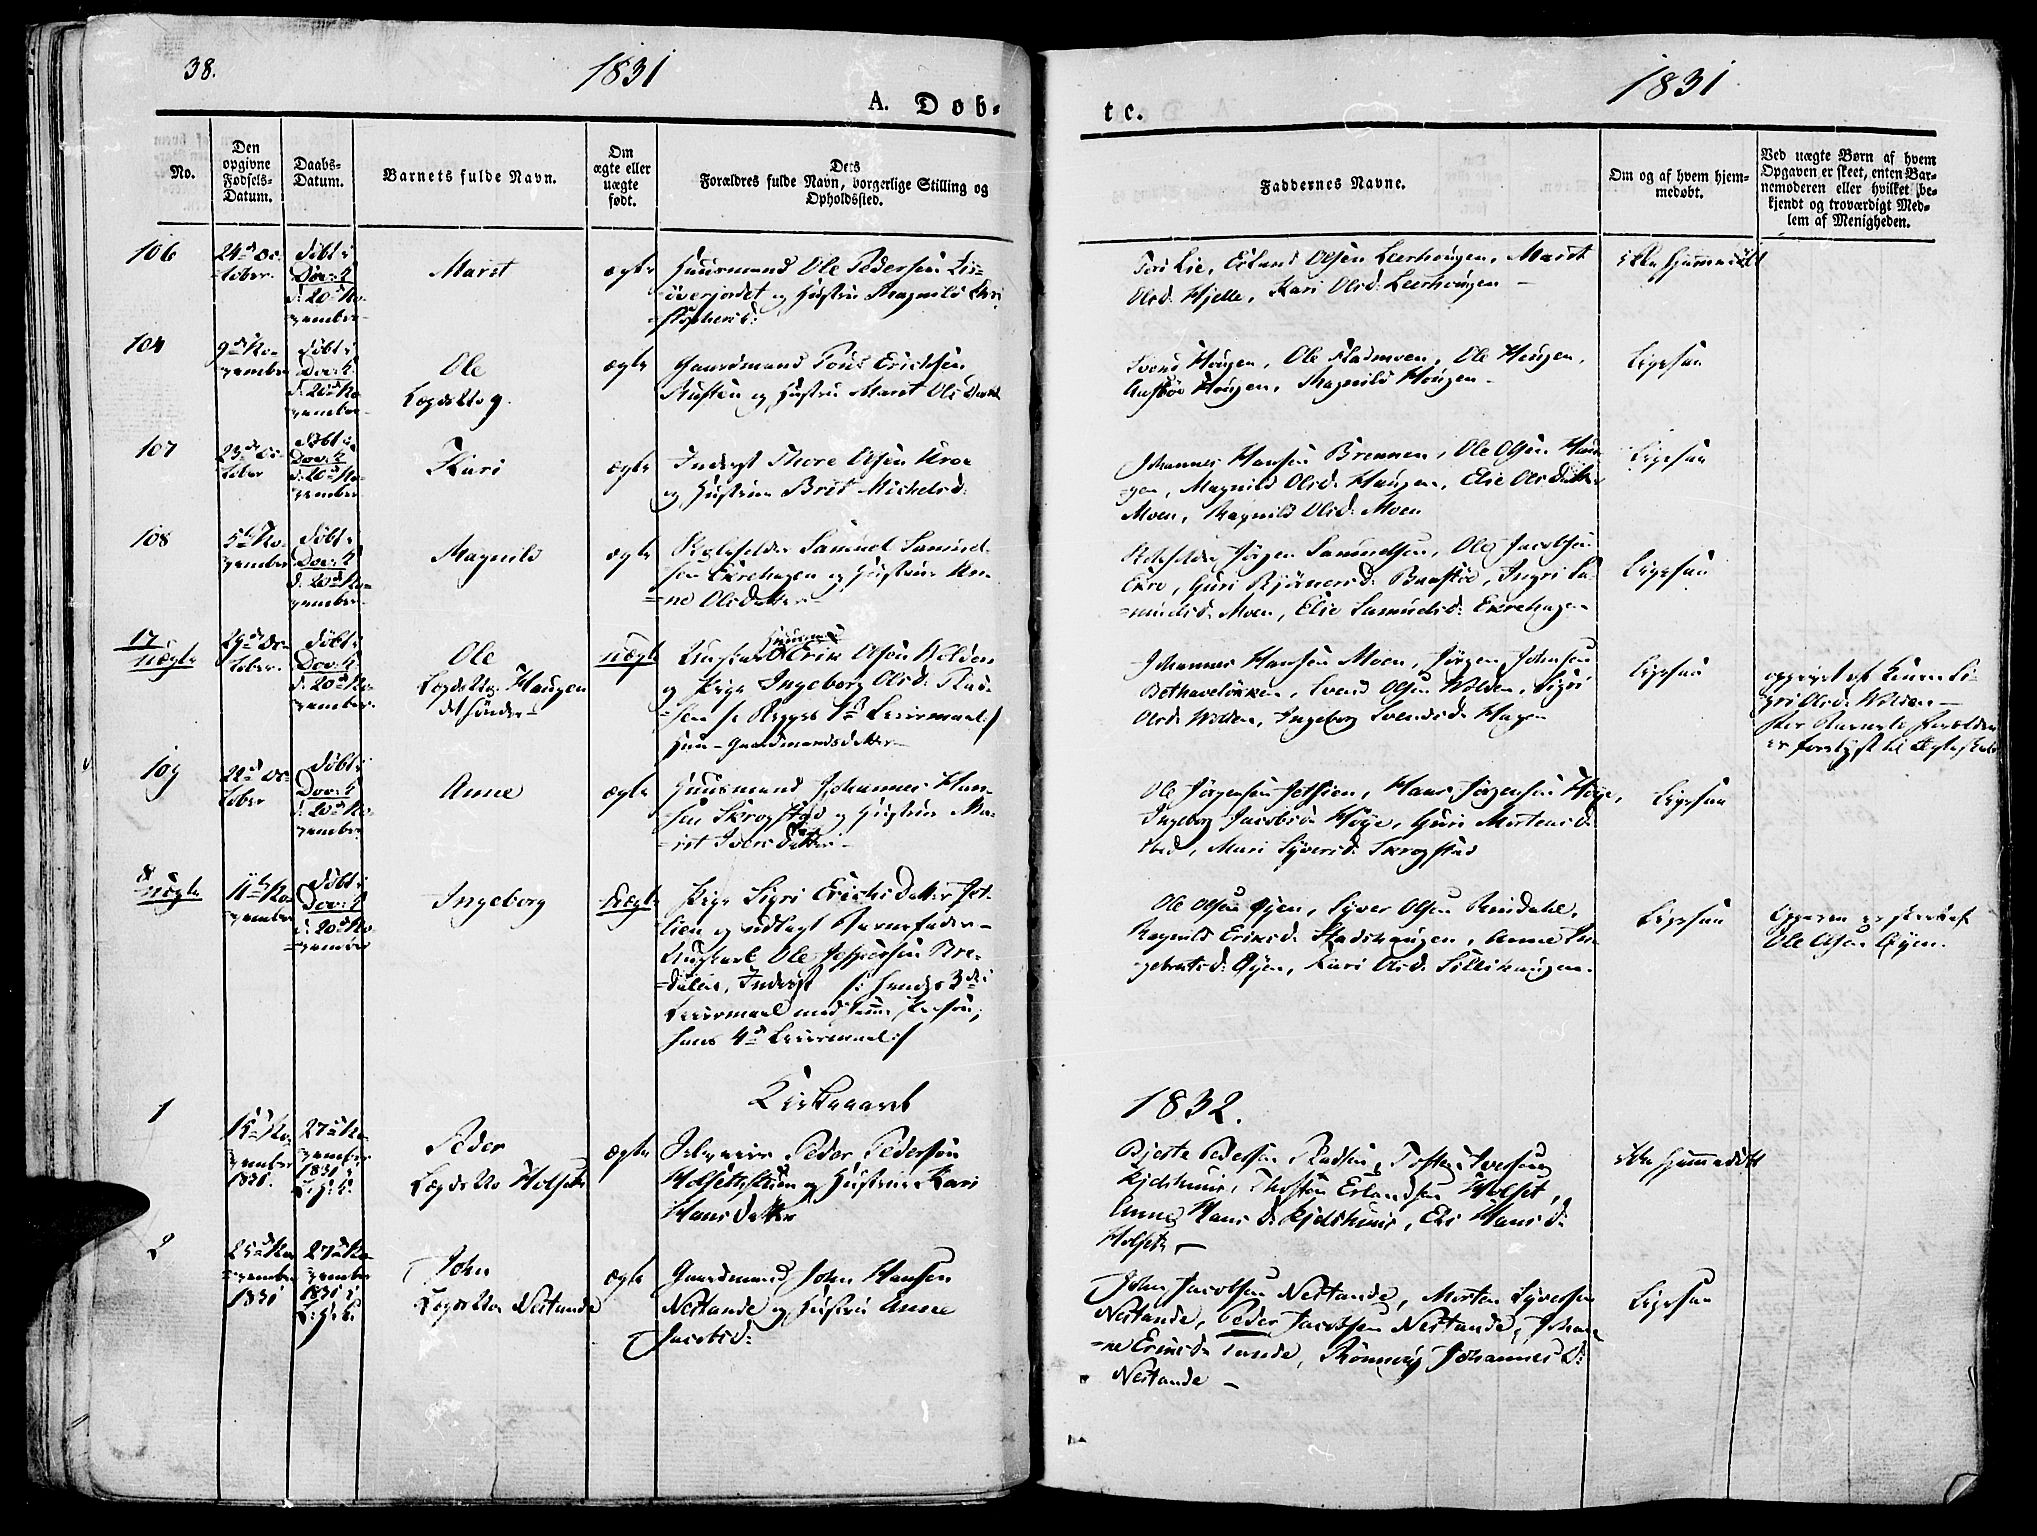 SAH, Lesja prestekontor, Ministerialbok nr. 5, 1830-1842, s. 38